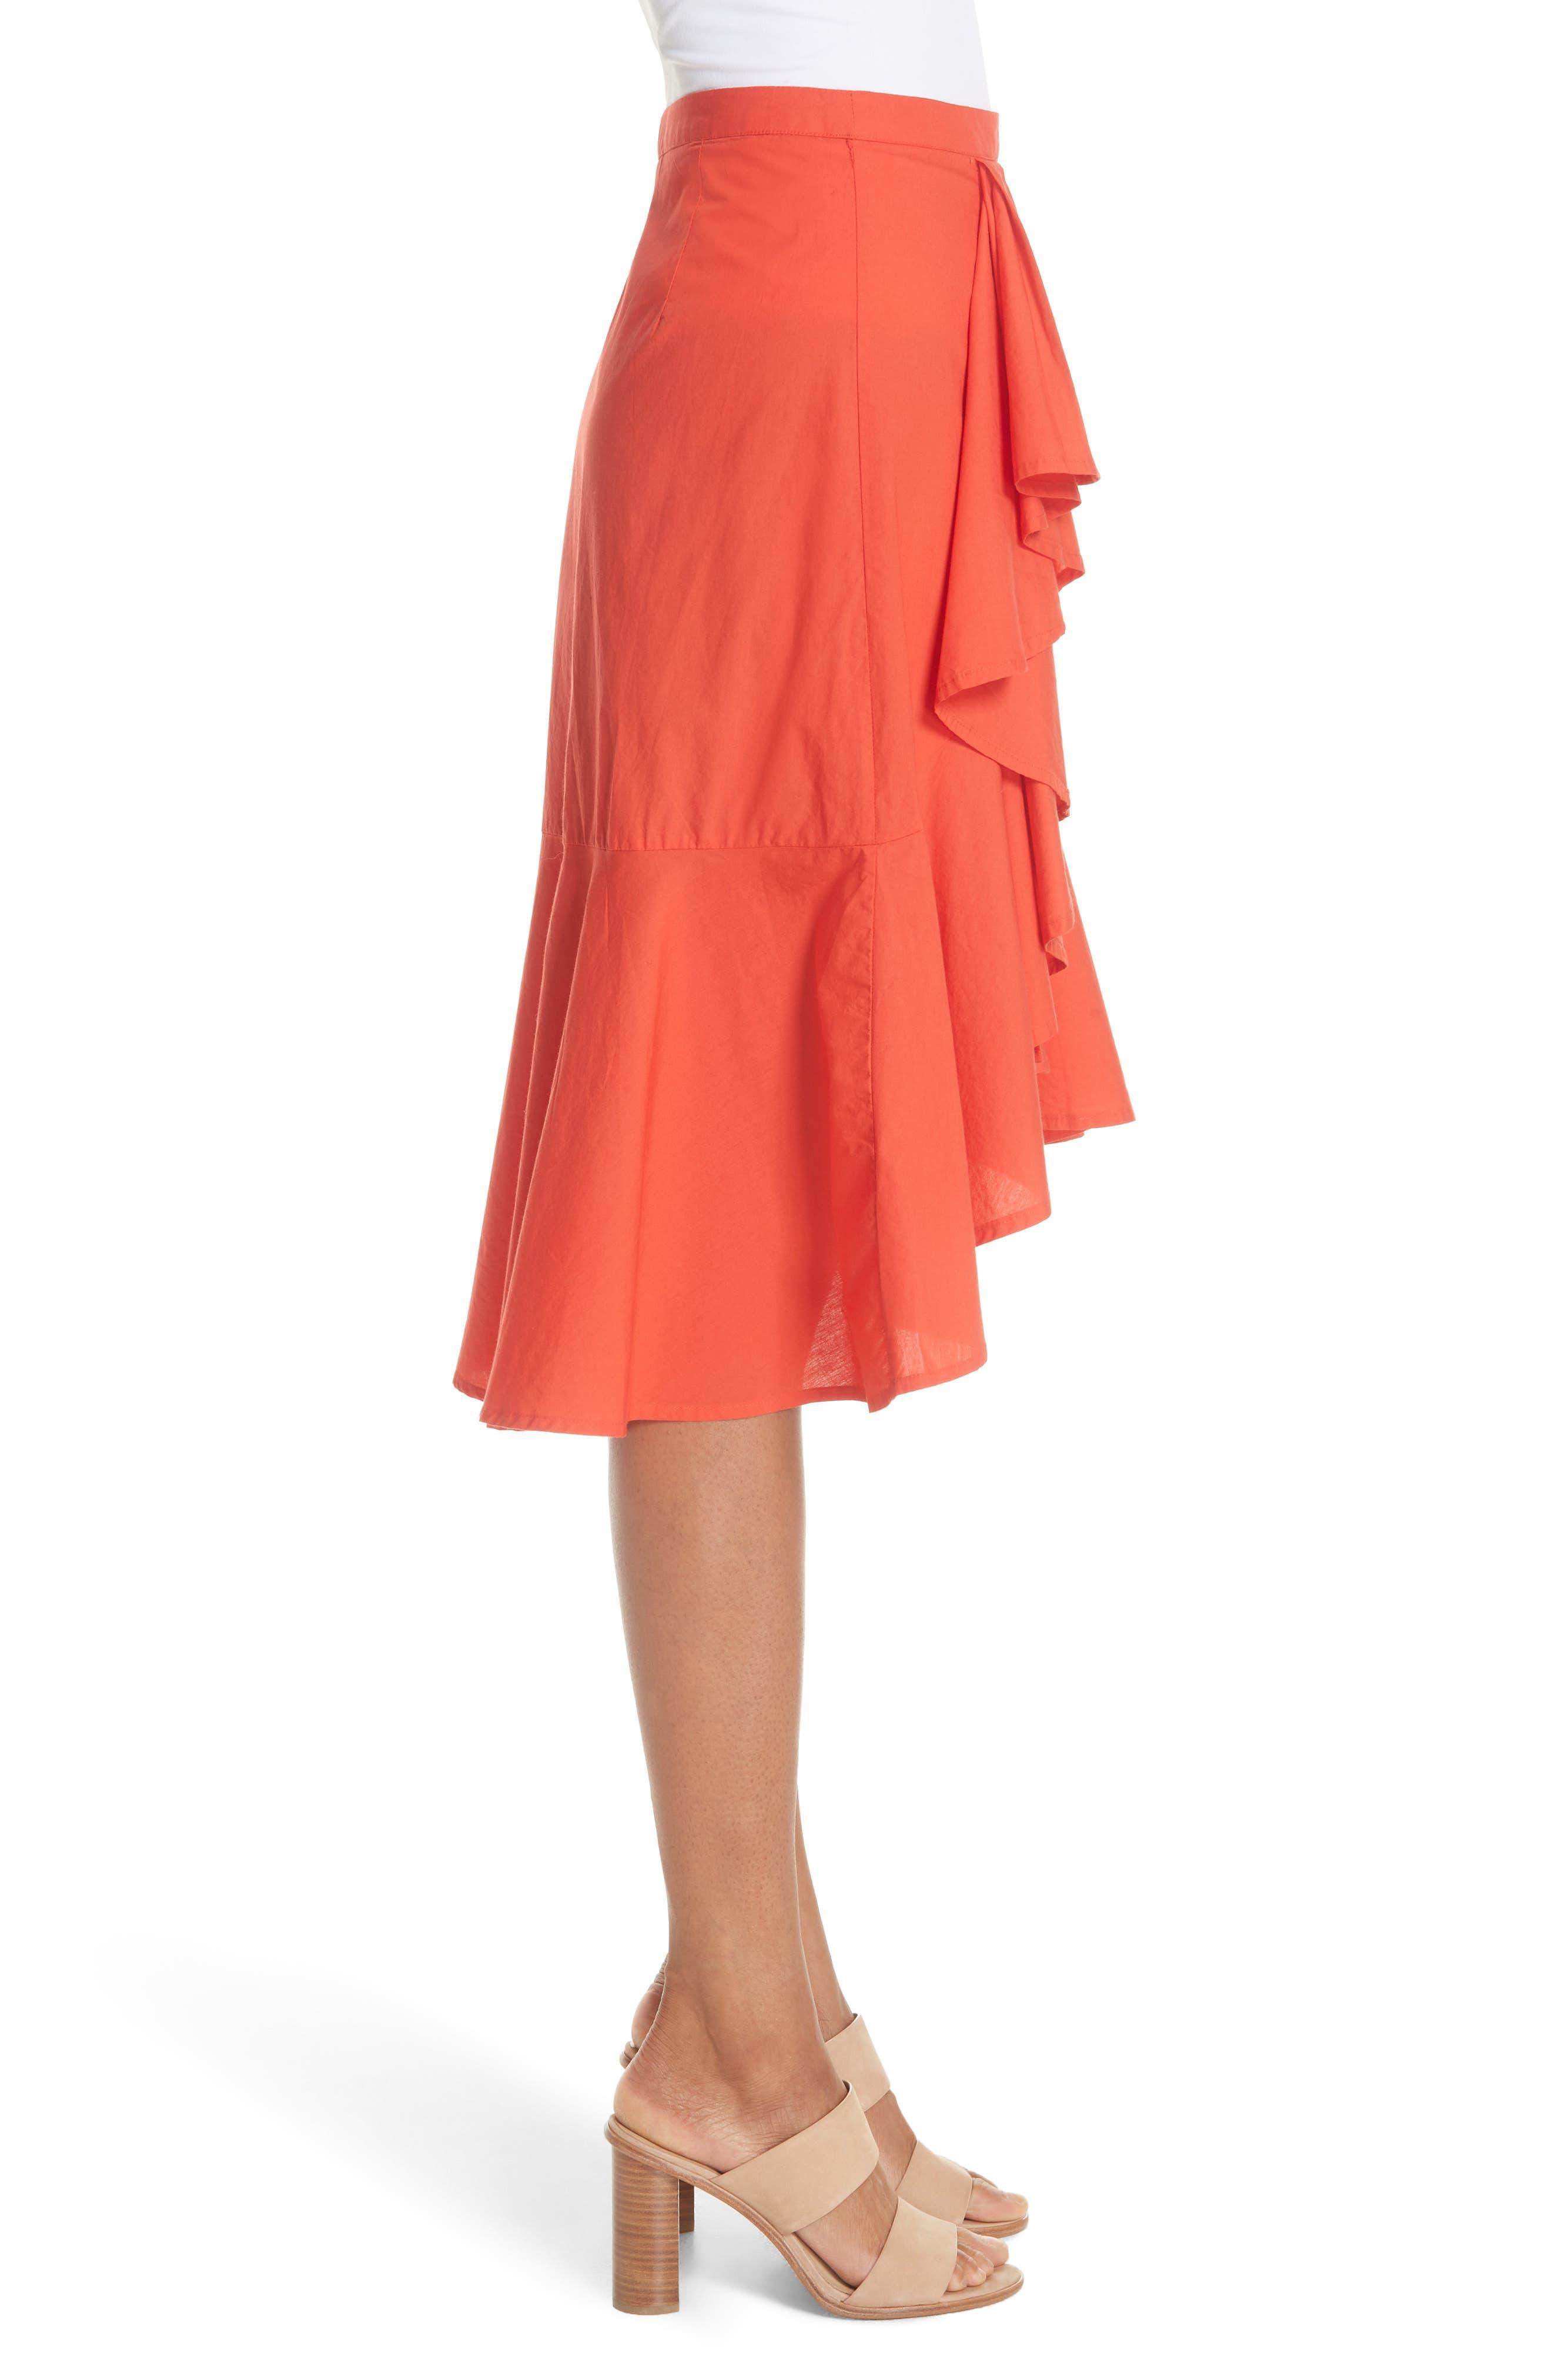 Chesmu Ruffled Cotton Skirt,                             Alternate thumbnail 3, color,                             Salsa